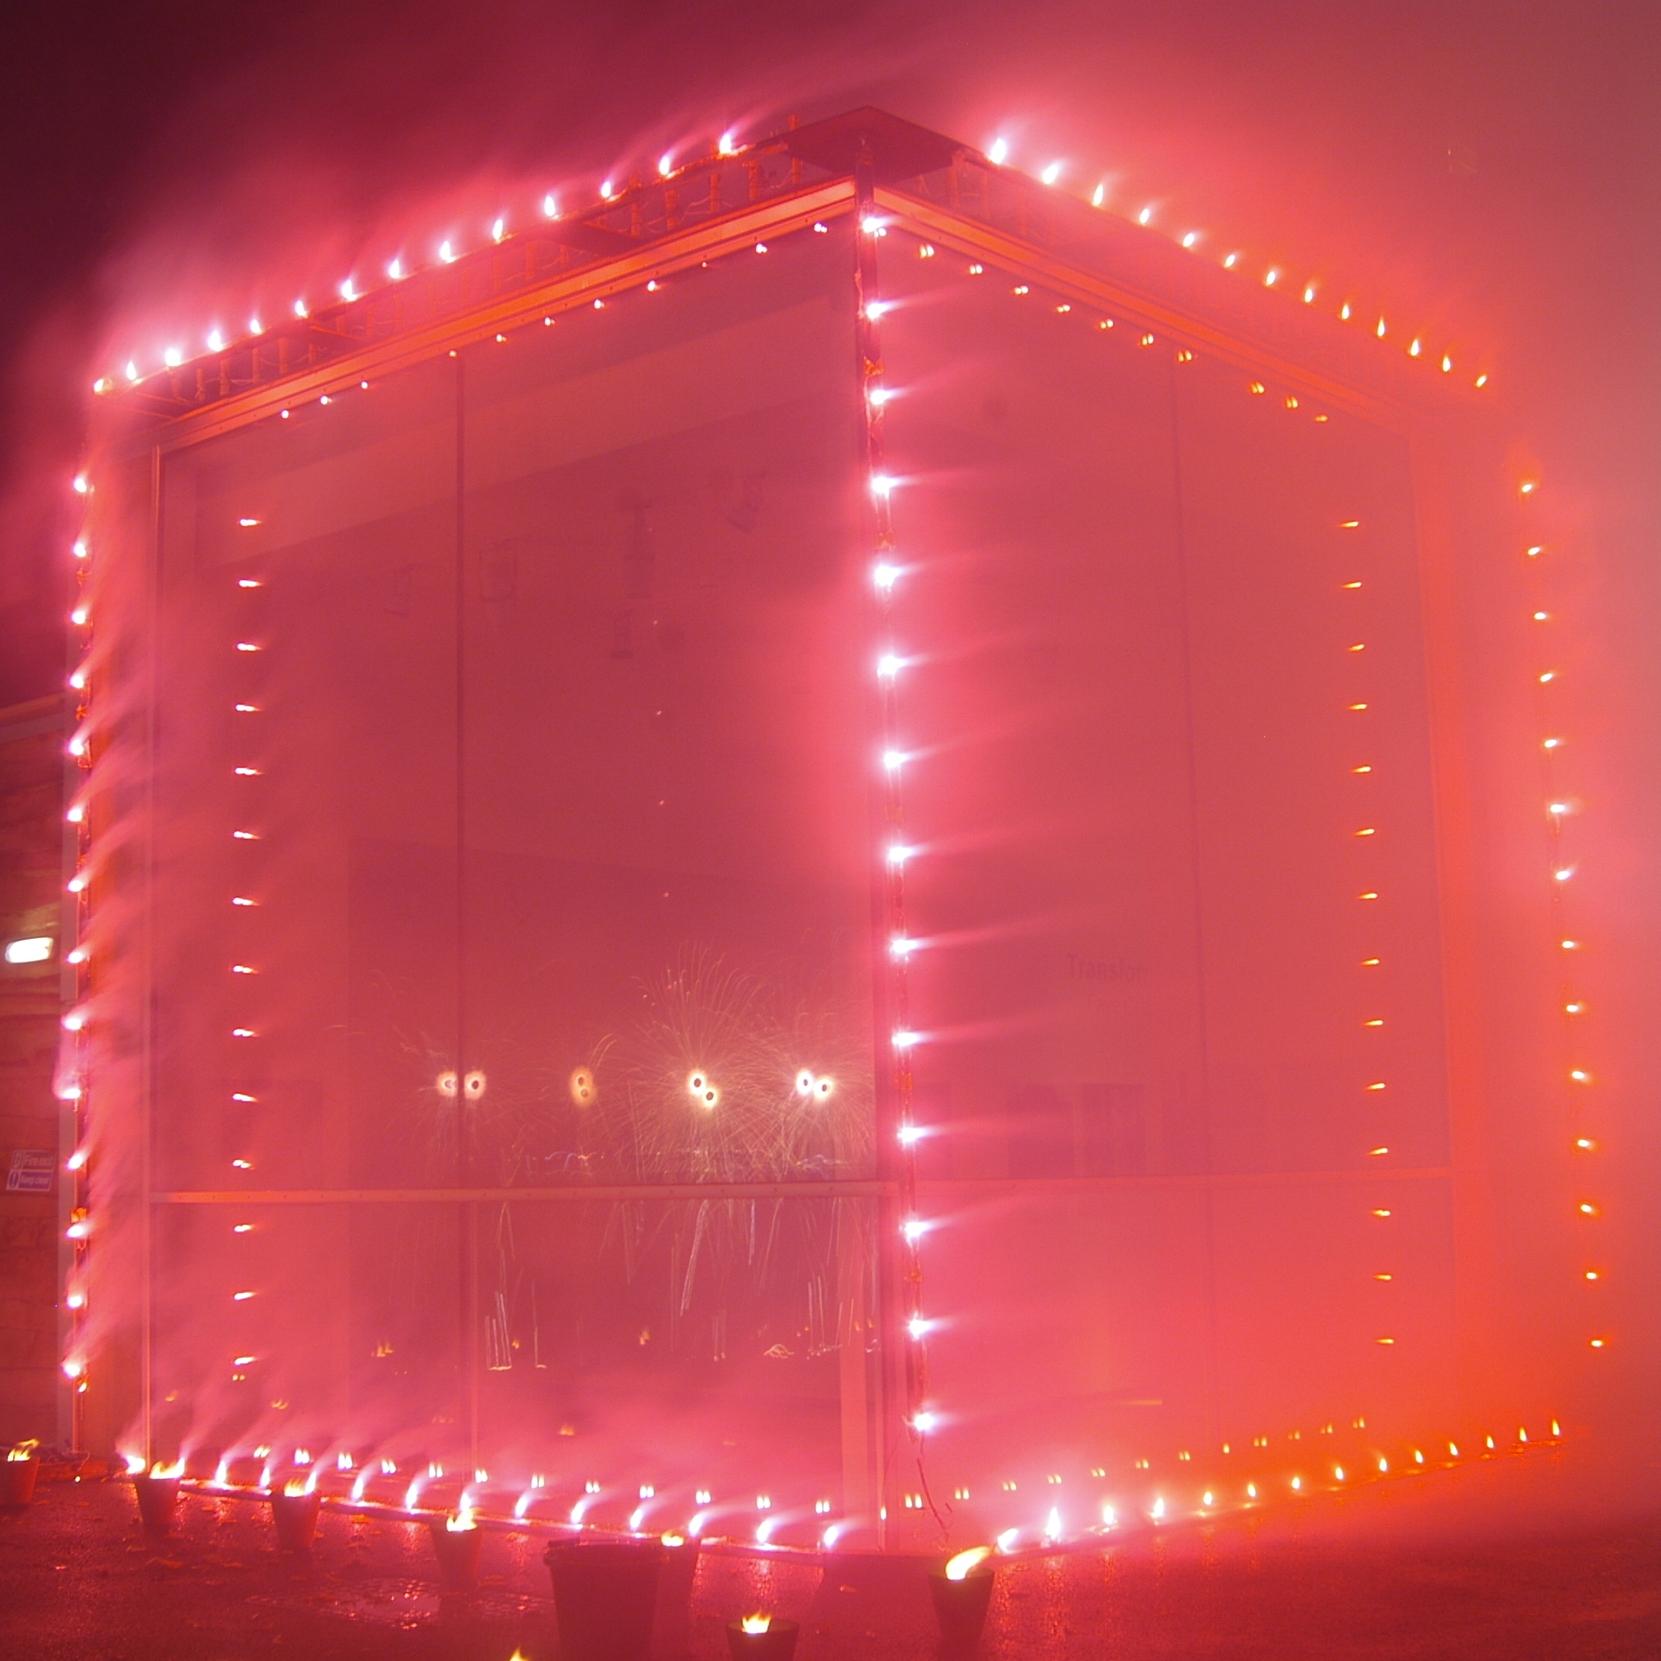 Chris Winch, visual arts + pyrotechnics  WWW.EGGILLUMINATIONS.COM